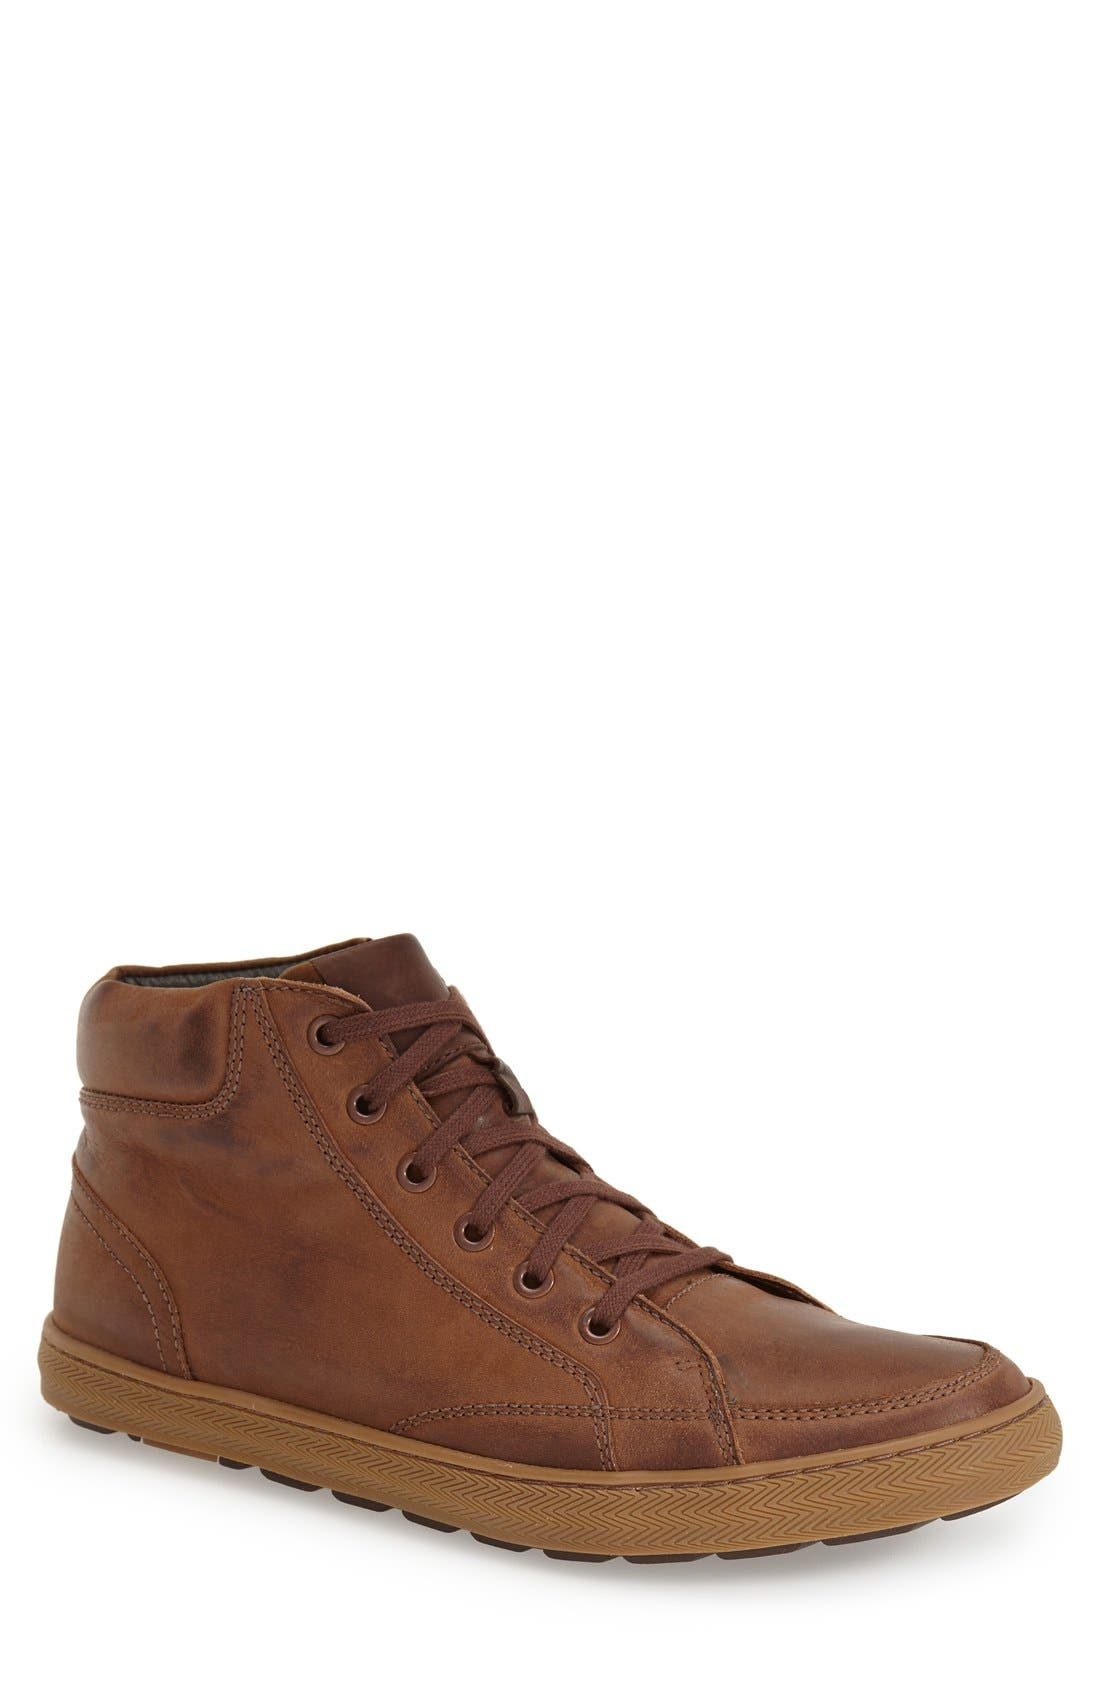 Santos Sneaker,                         Main,                         color, Brown